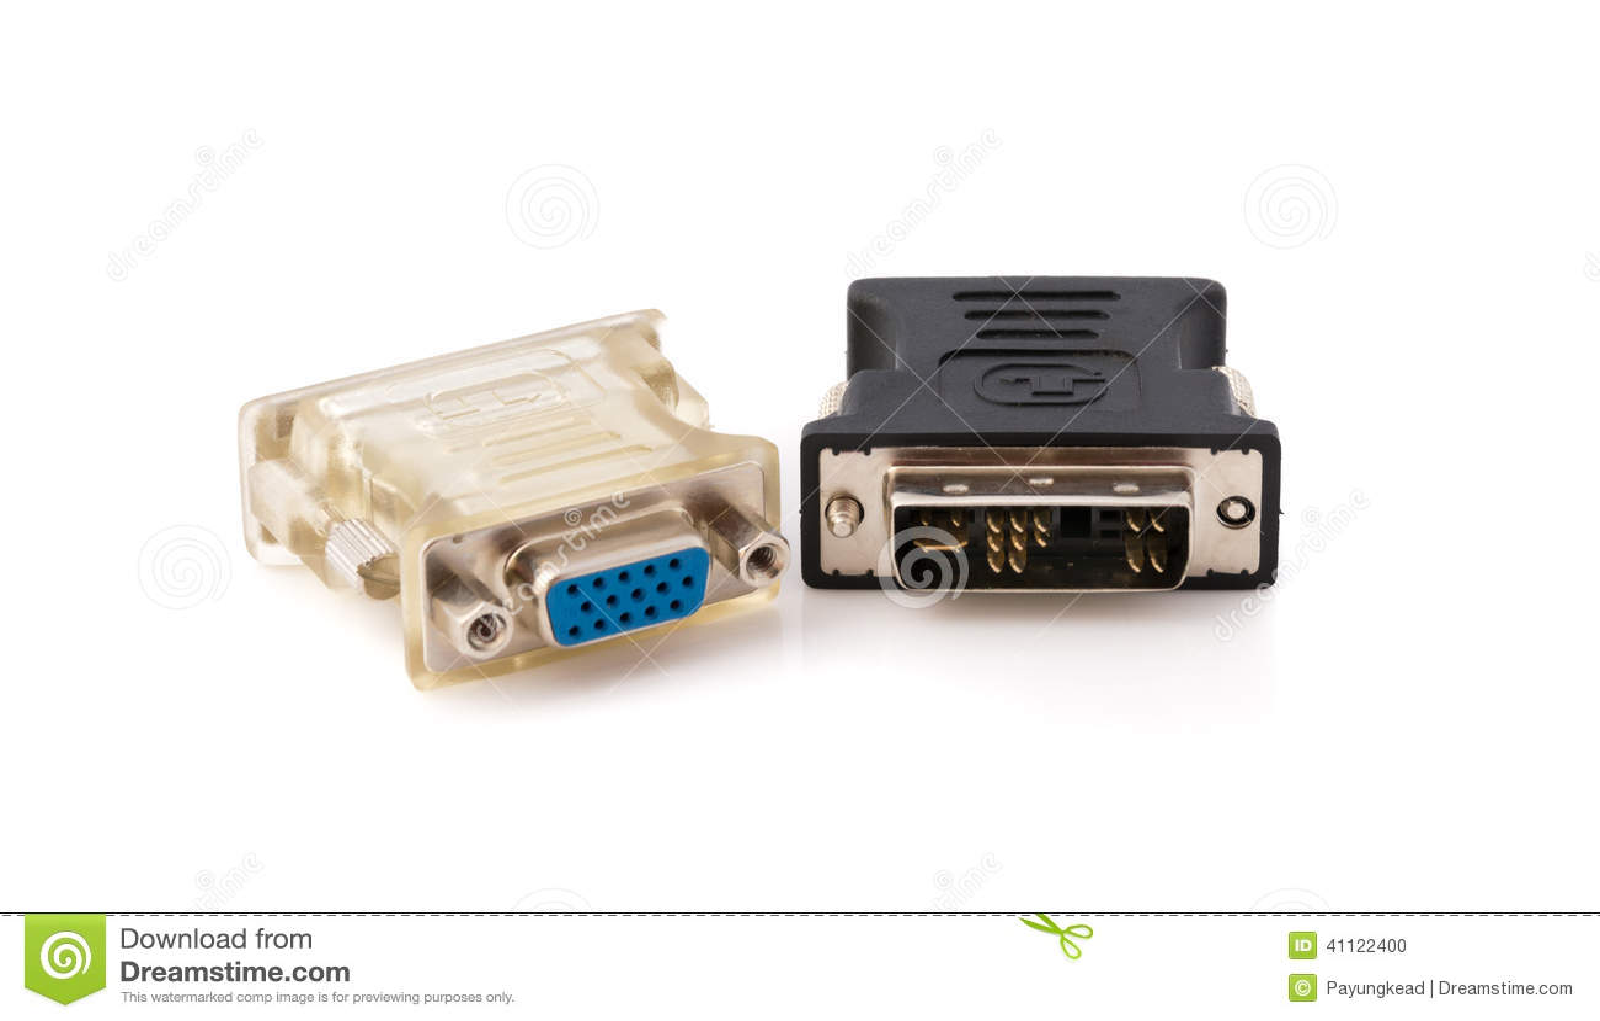 Vga To Dvi Display Converter Stock Photo Image Of Hardware Macro Konventer